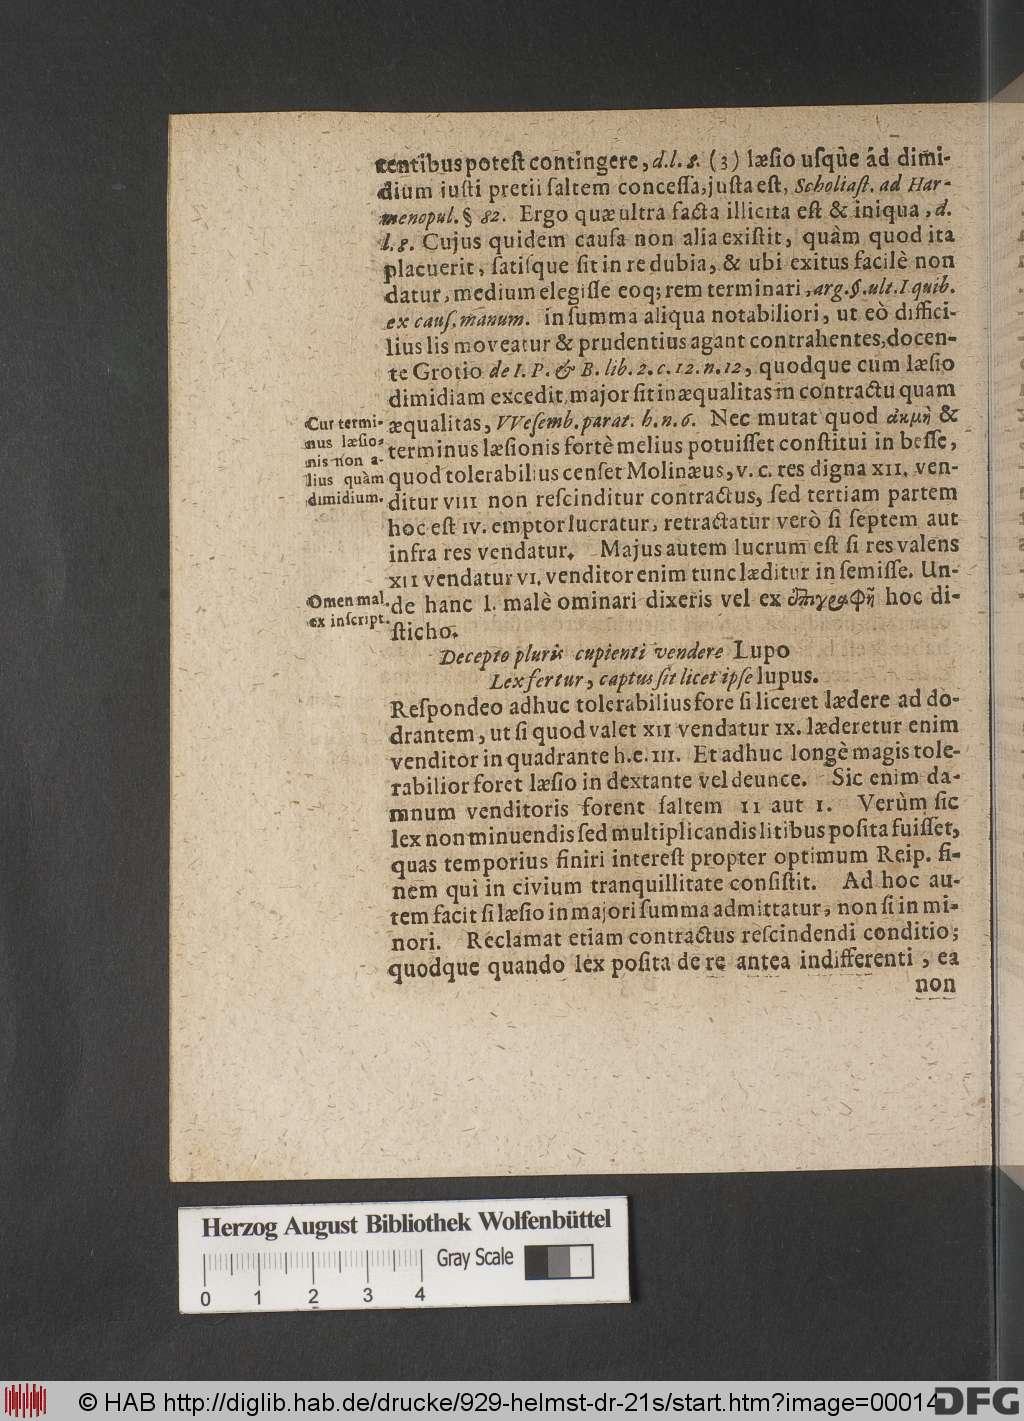 https://diglib.hab.de/drucke/929-helmst-dr-21s/00014.jpg